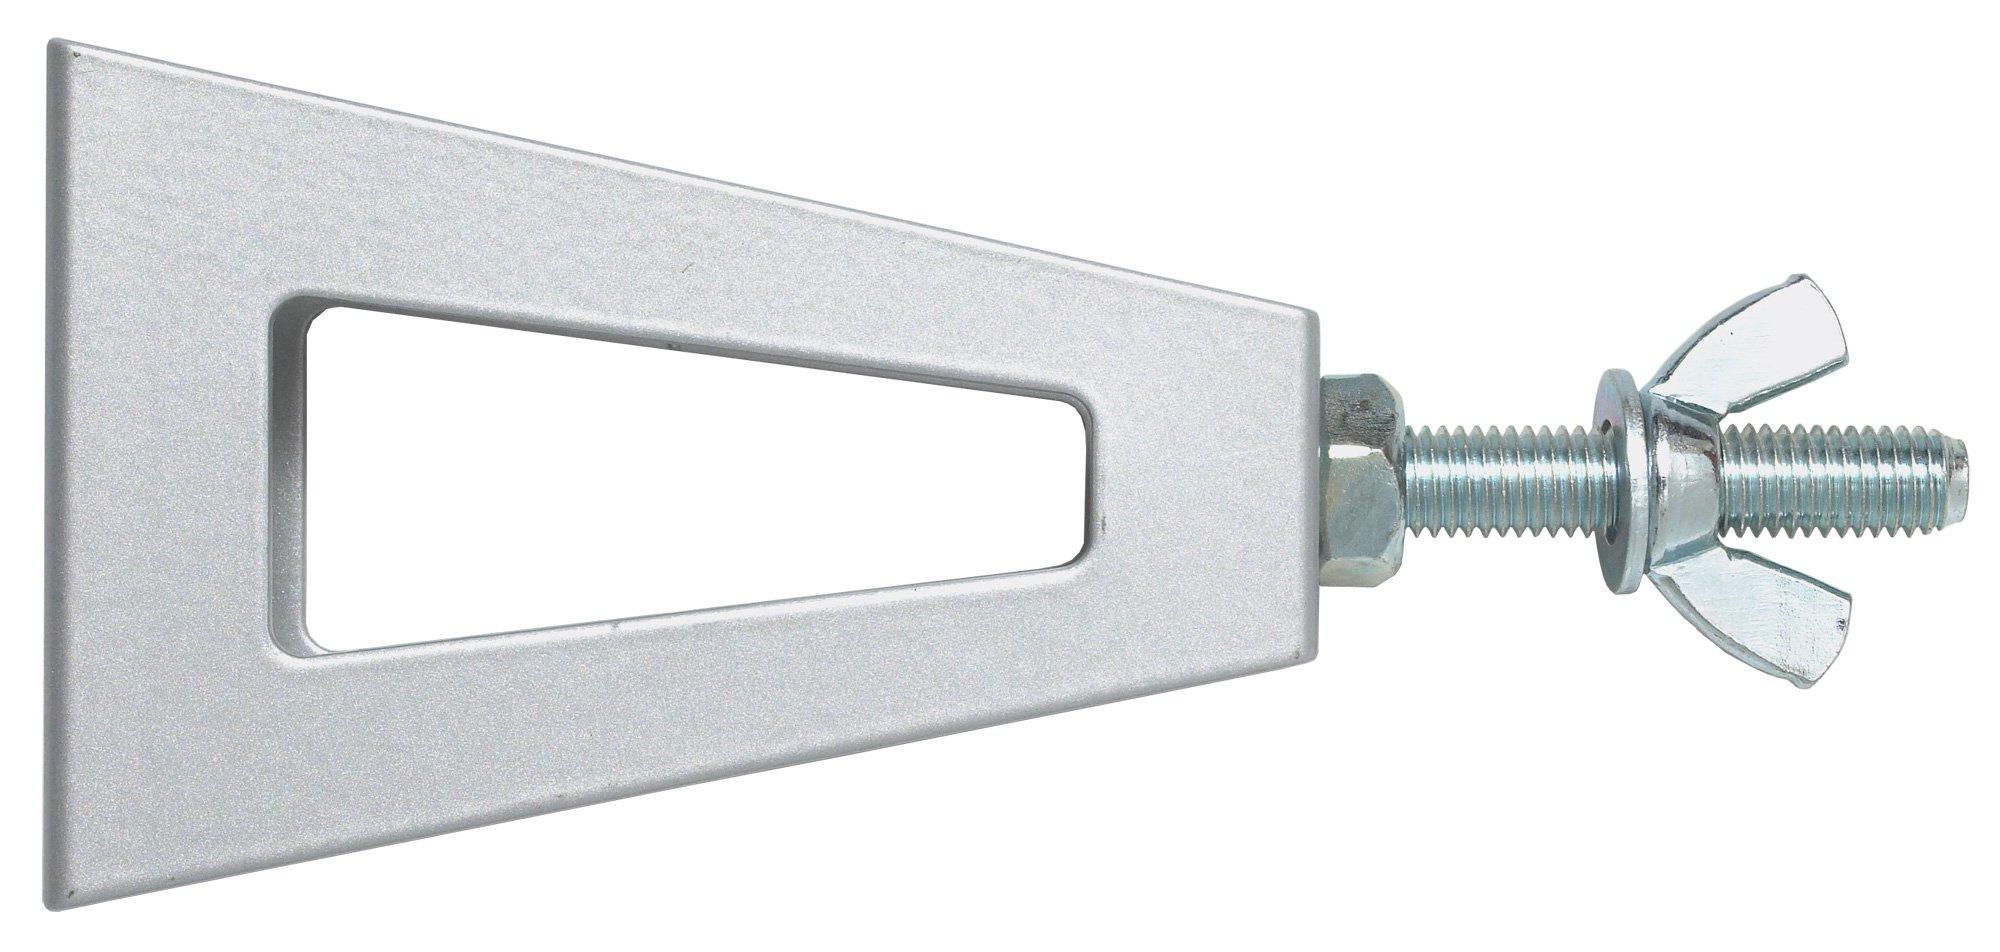 Element System DY222034 Rim Mount Reifenhalter 2 x H x D 75 x 180 MM White Aluminium, 18133–00119